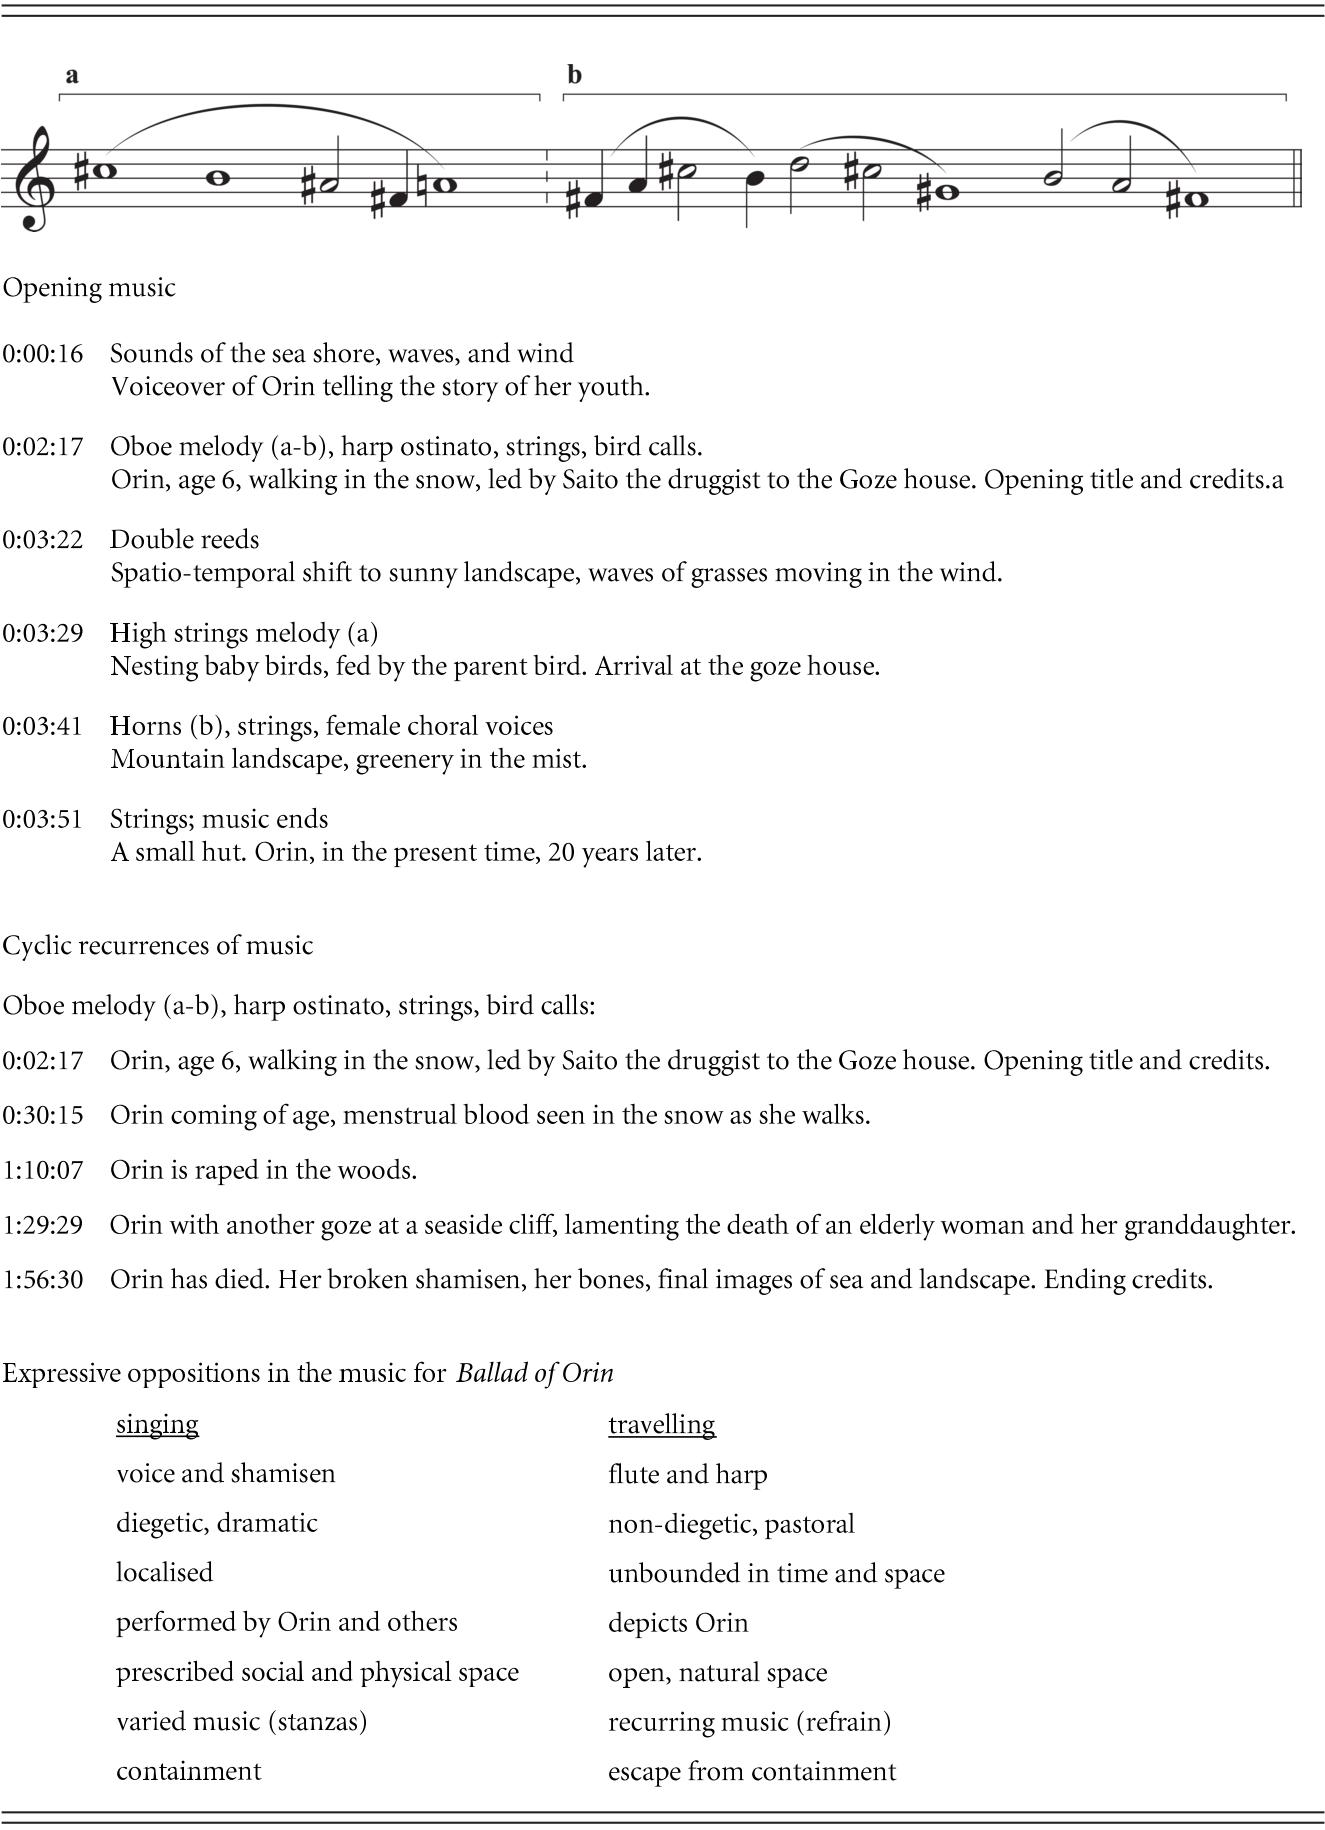 Music in World Cinemas (Part Four) - The Cambridge Companion